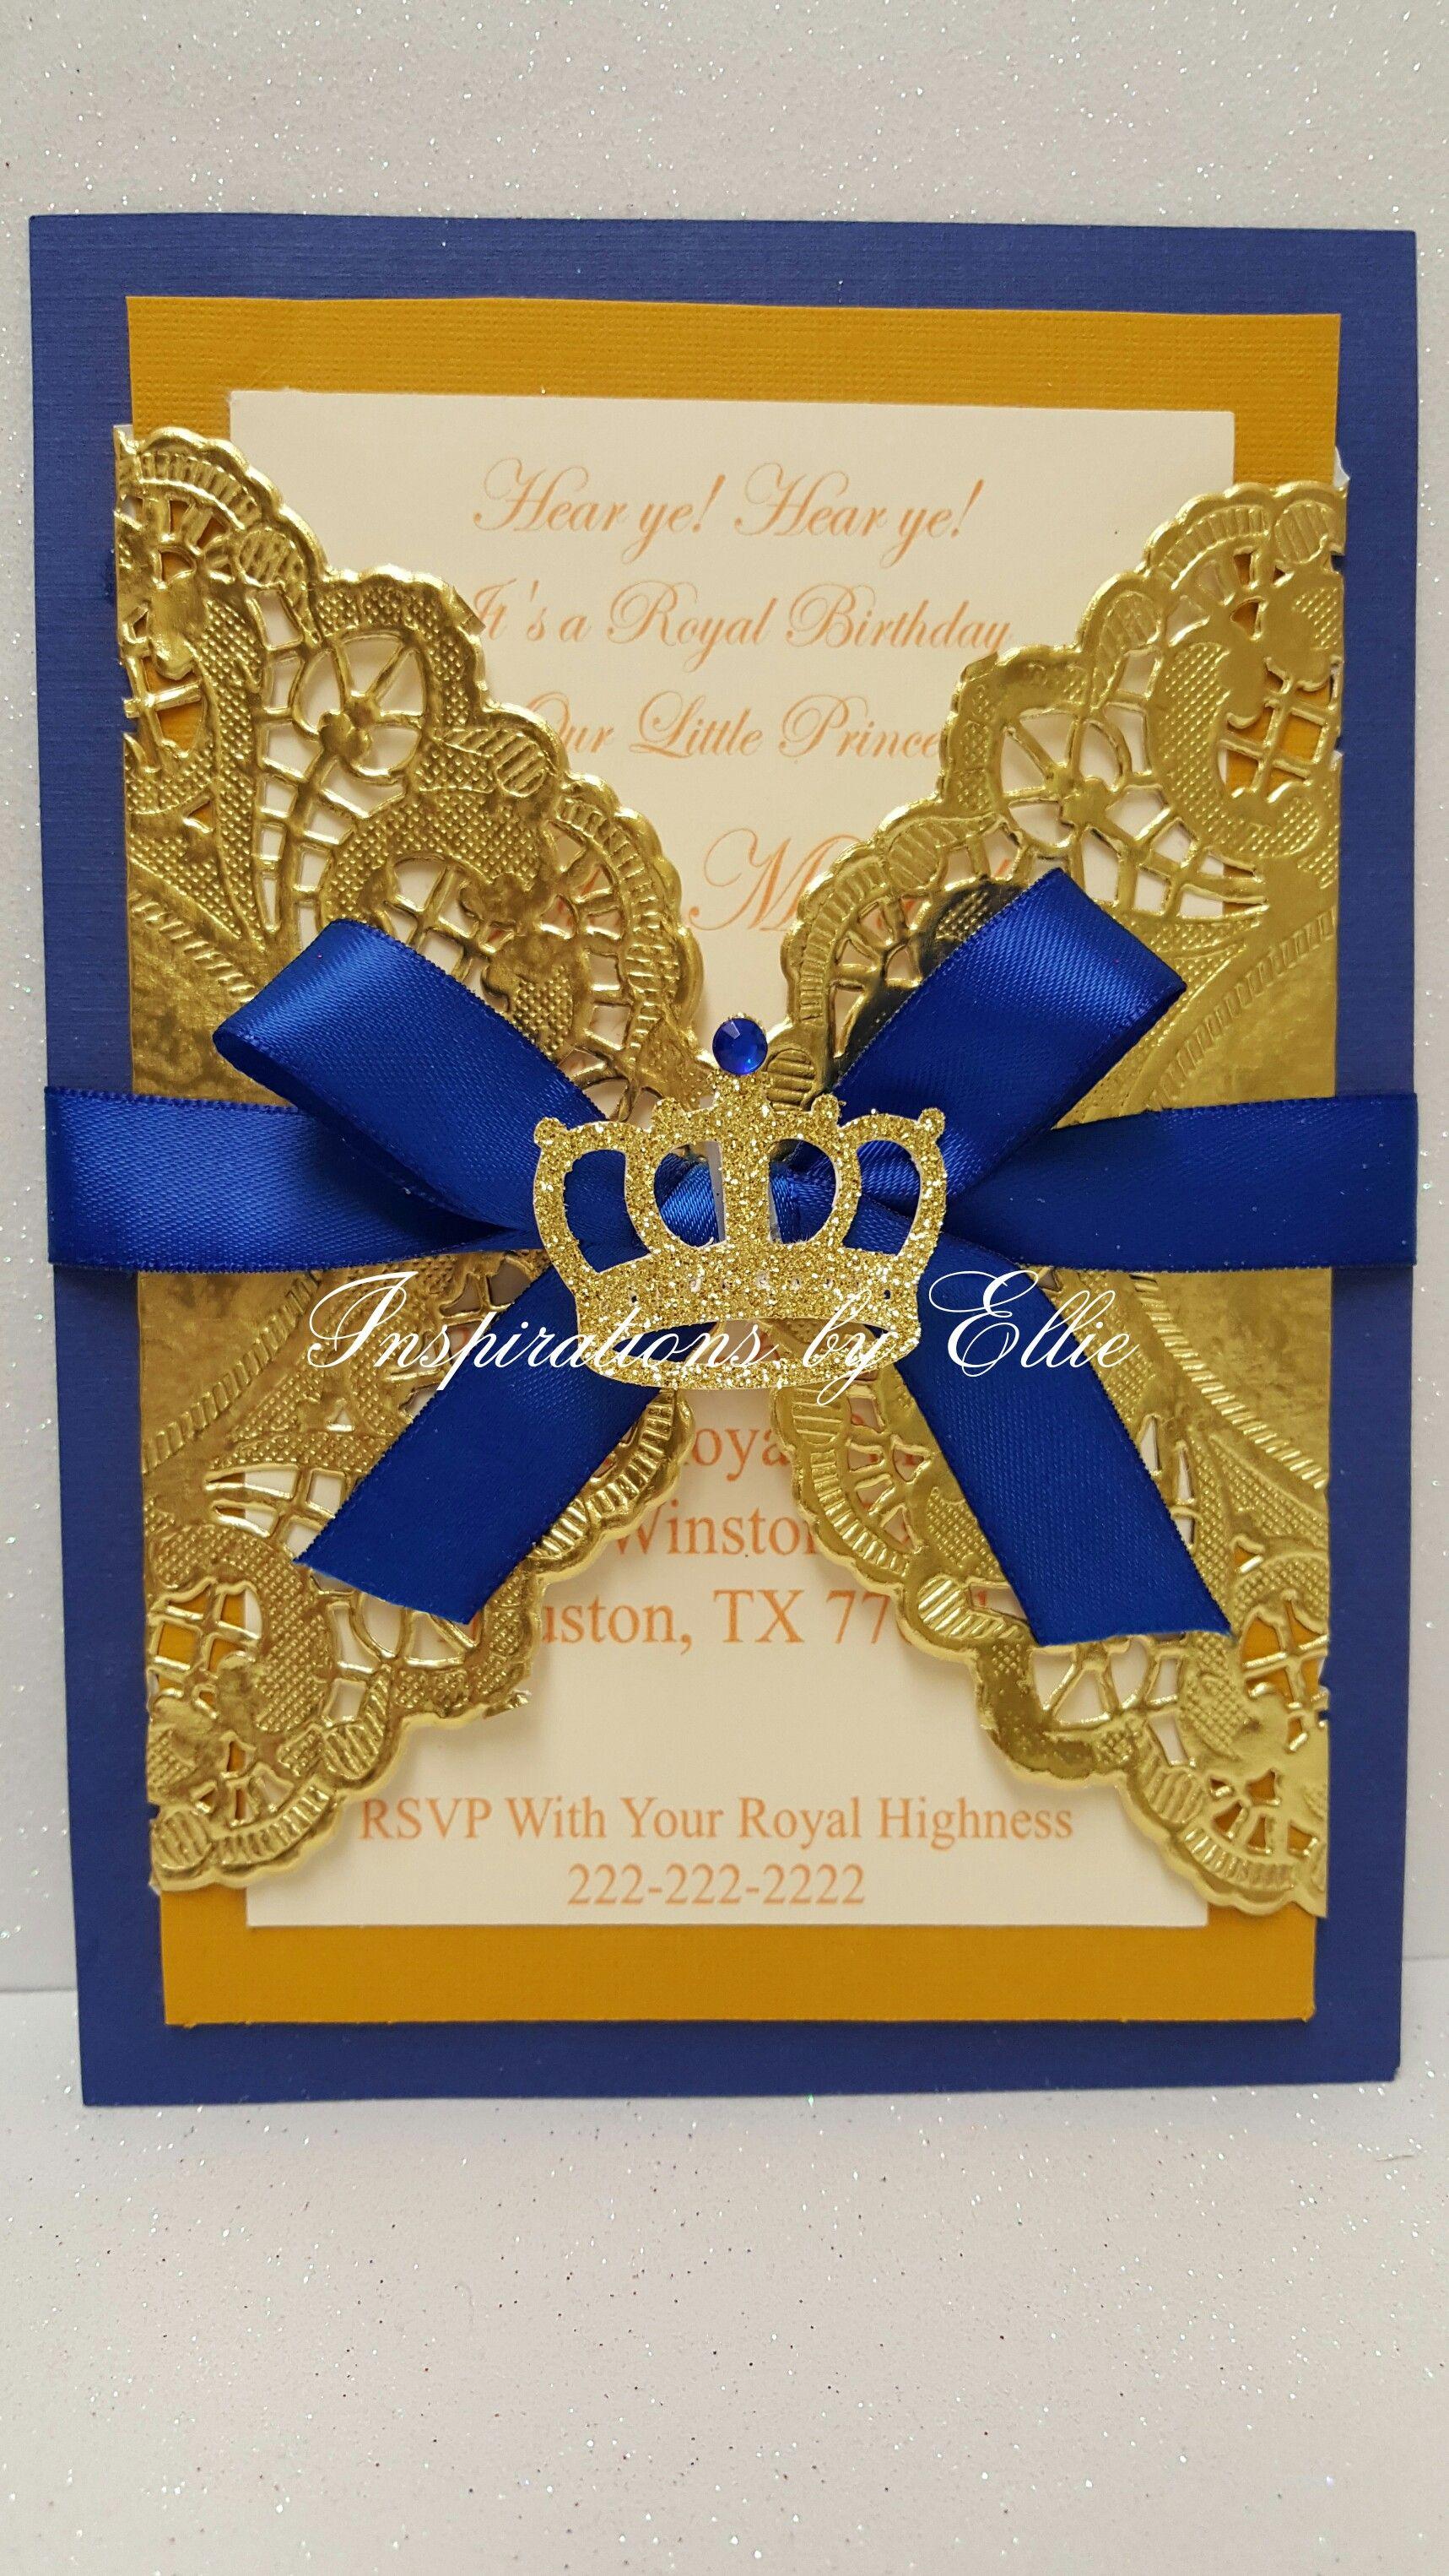 Royal Prince Birthday Invitations Set of 12 | Birthday Invitations ...